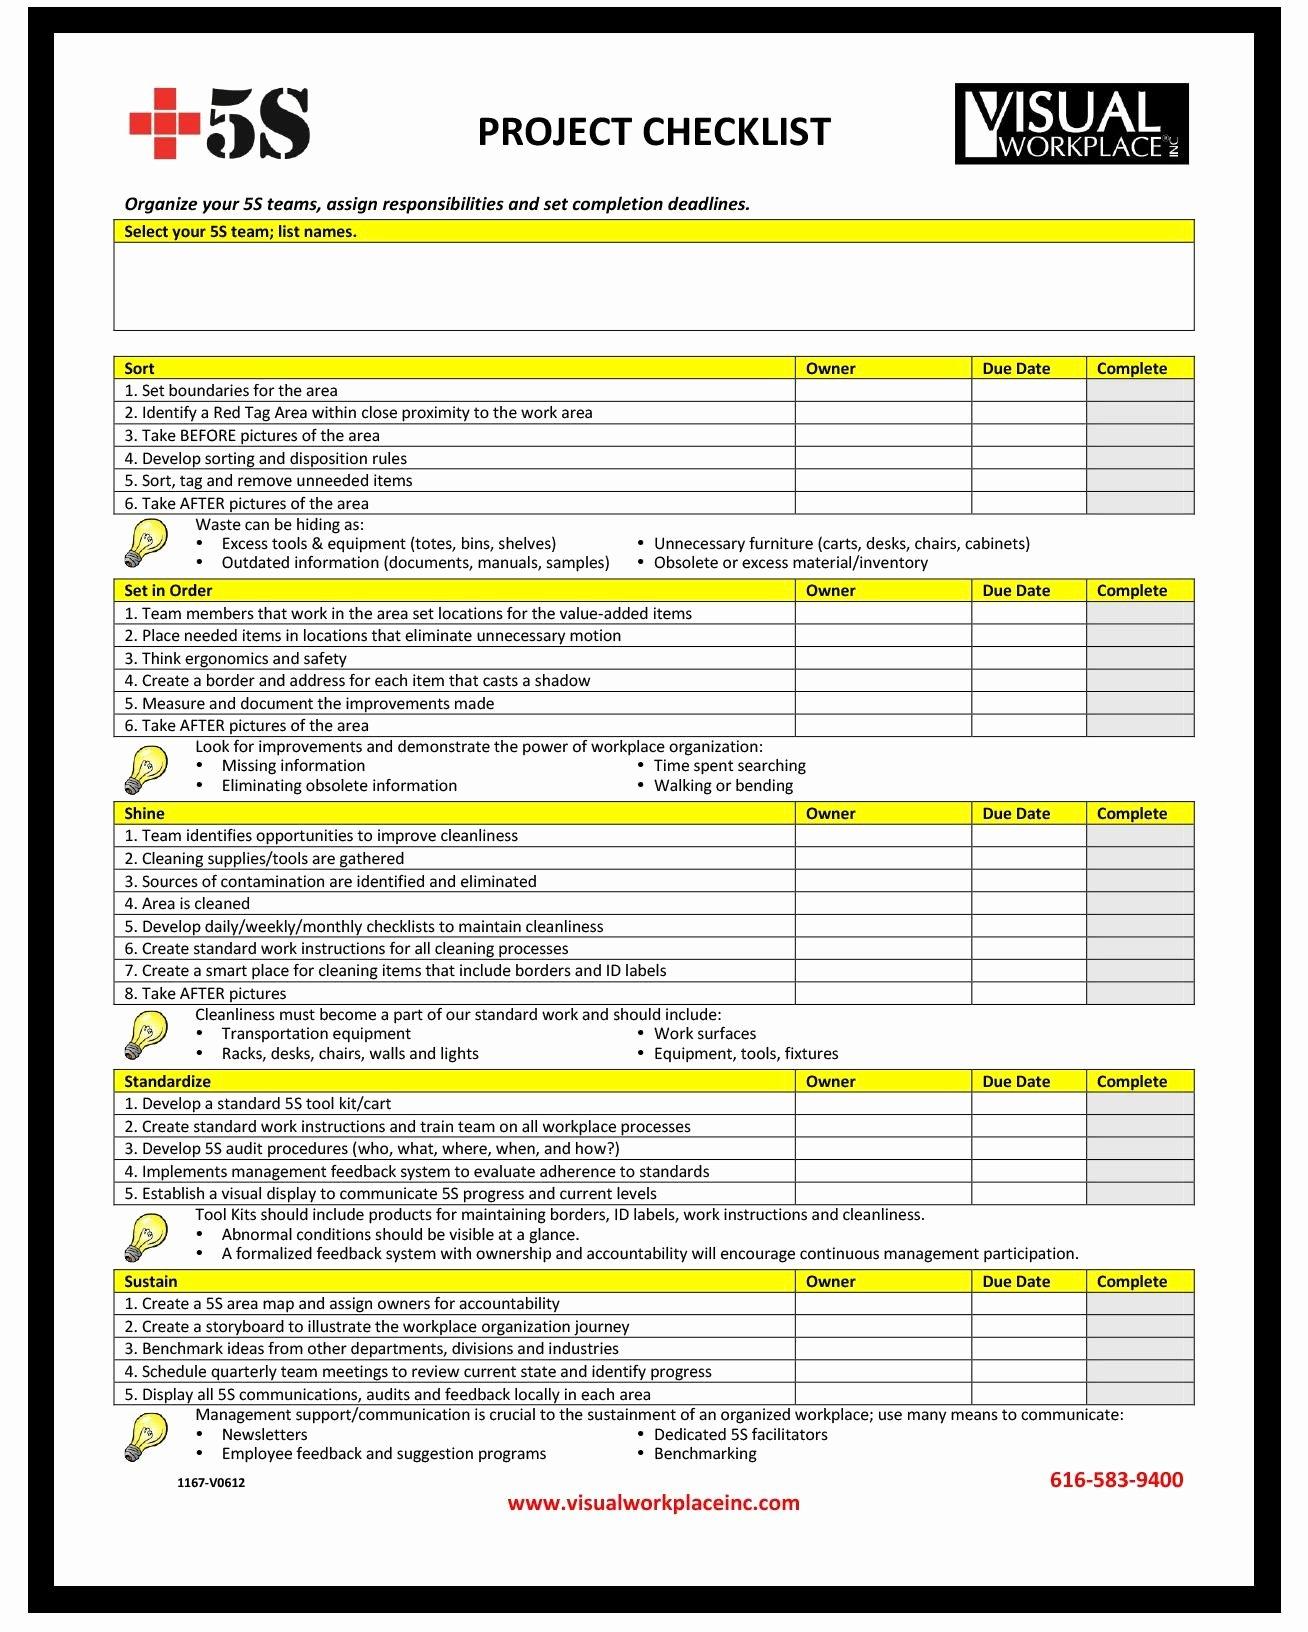 Checklist Project Checklist Template